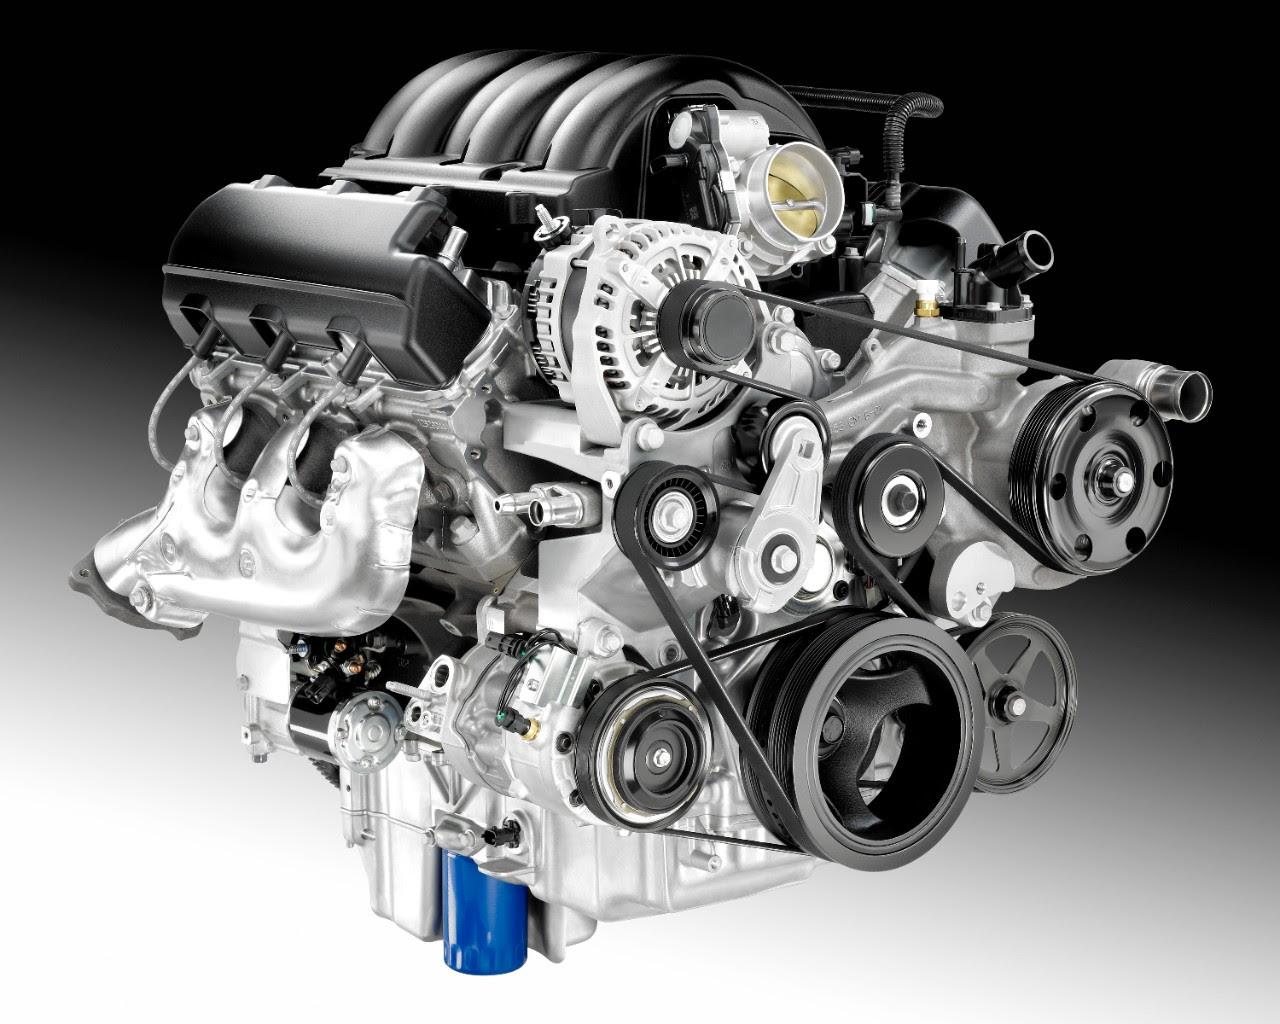 Diagram Diagram For 3 4 Liter V6 Engine Full Version Hd Quality V6 Engine Wiringinc1d Piuitaliapopoloitalianounito It